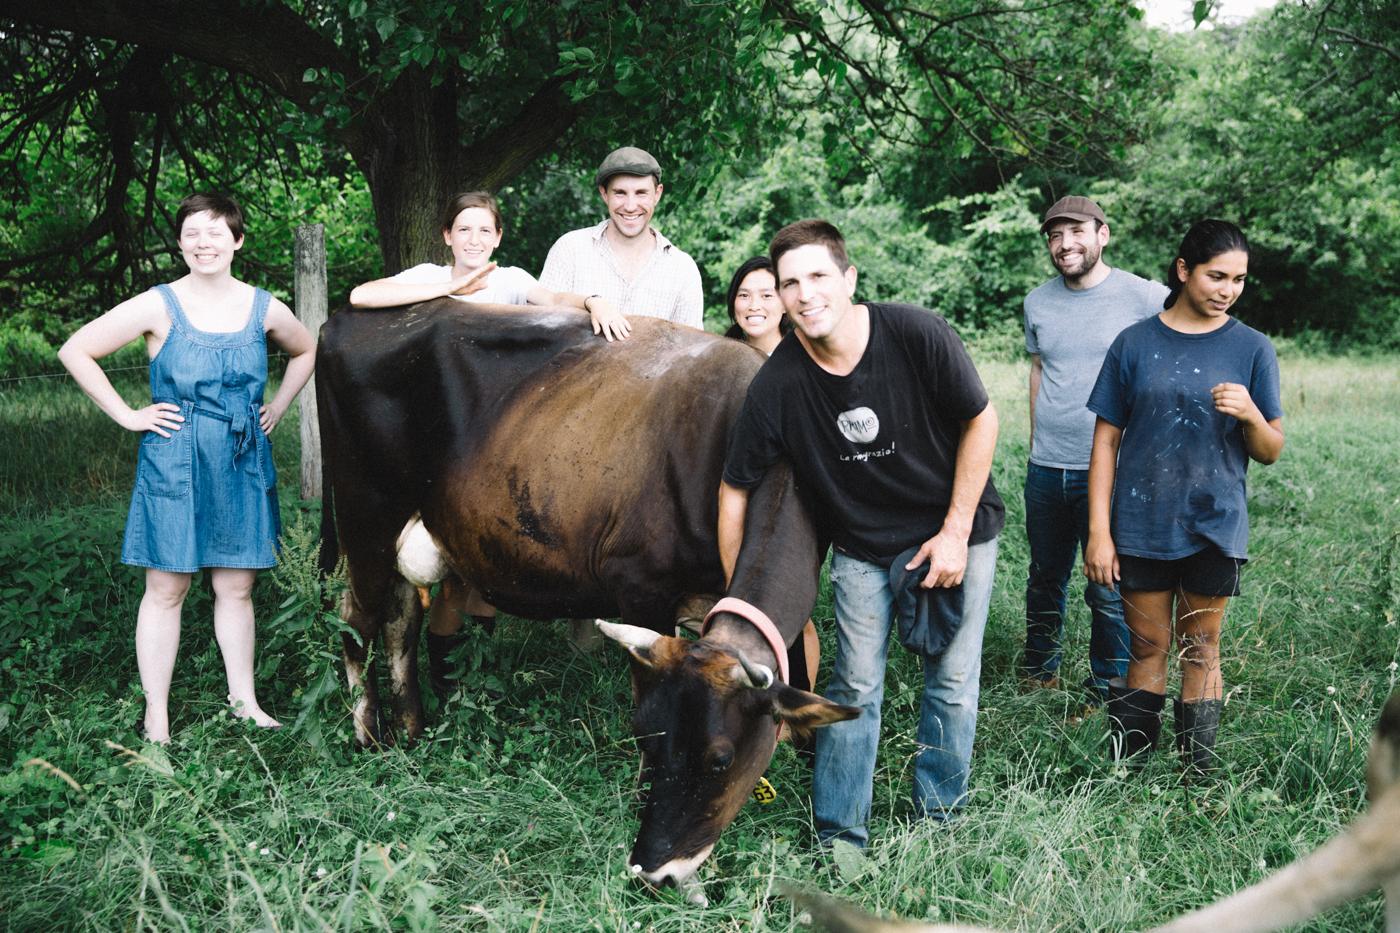 Weckerlys+Camphill+Cow.jpg